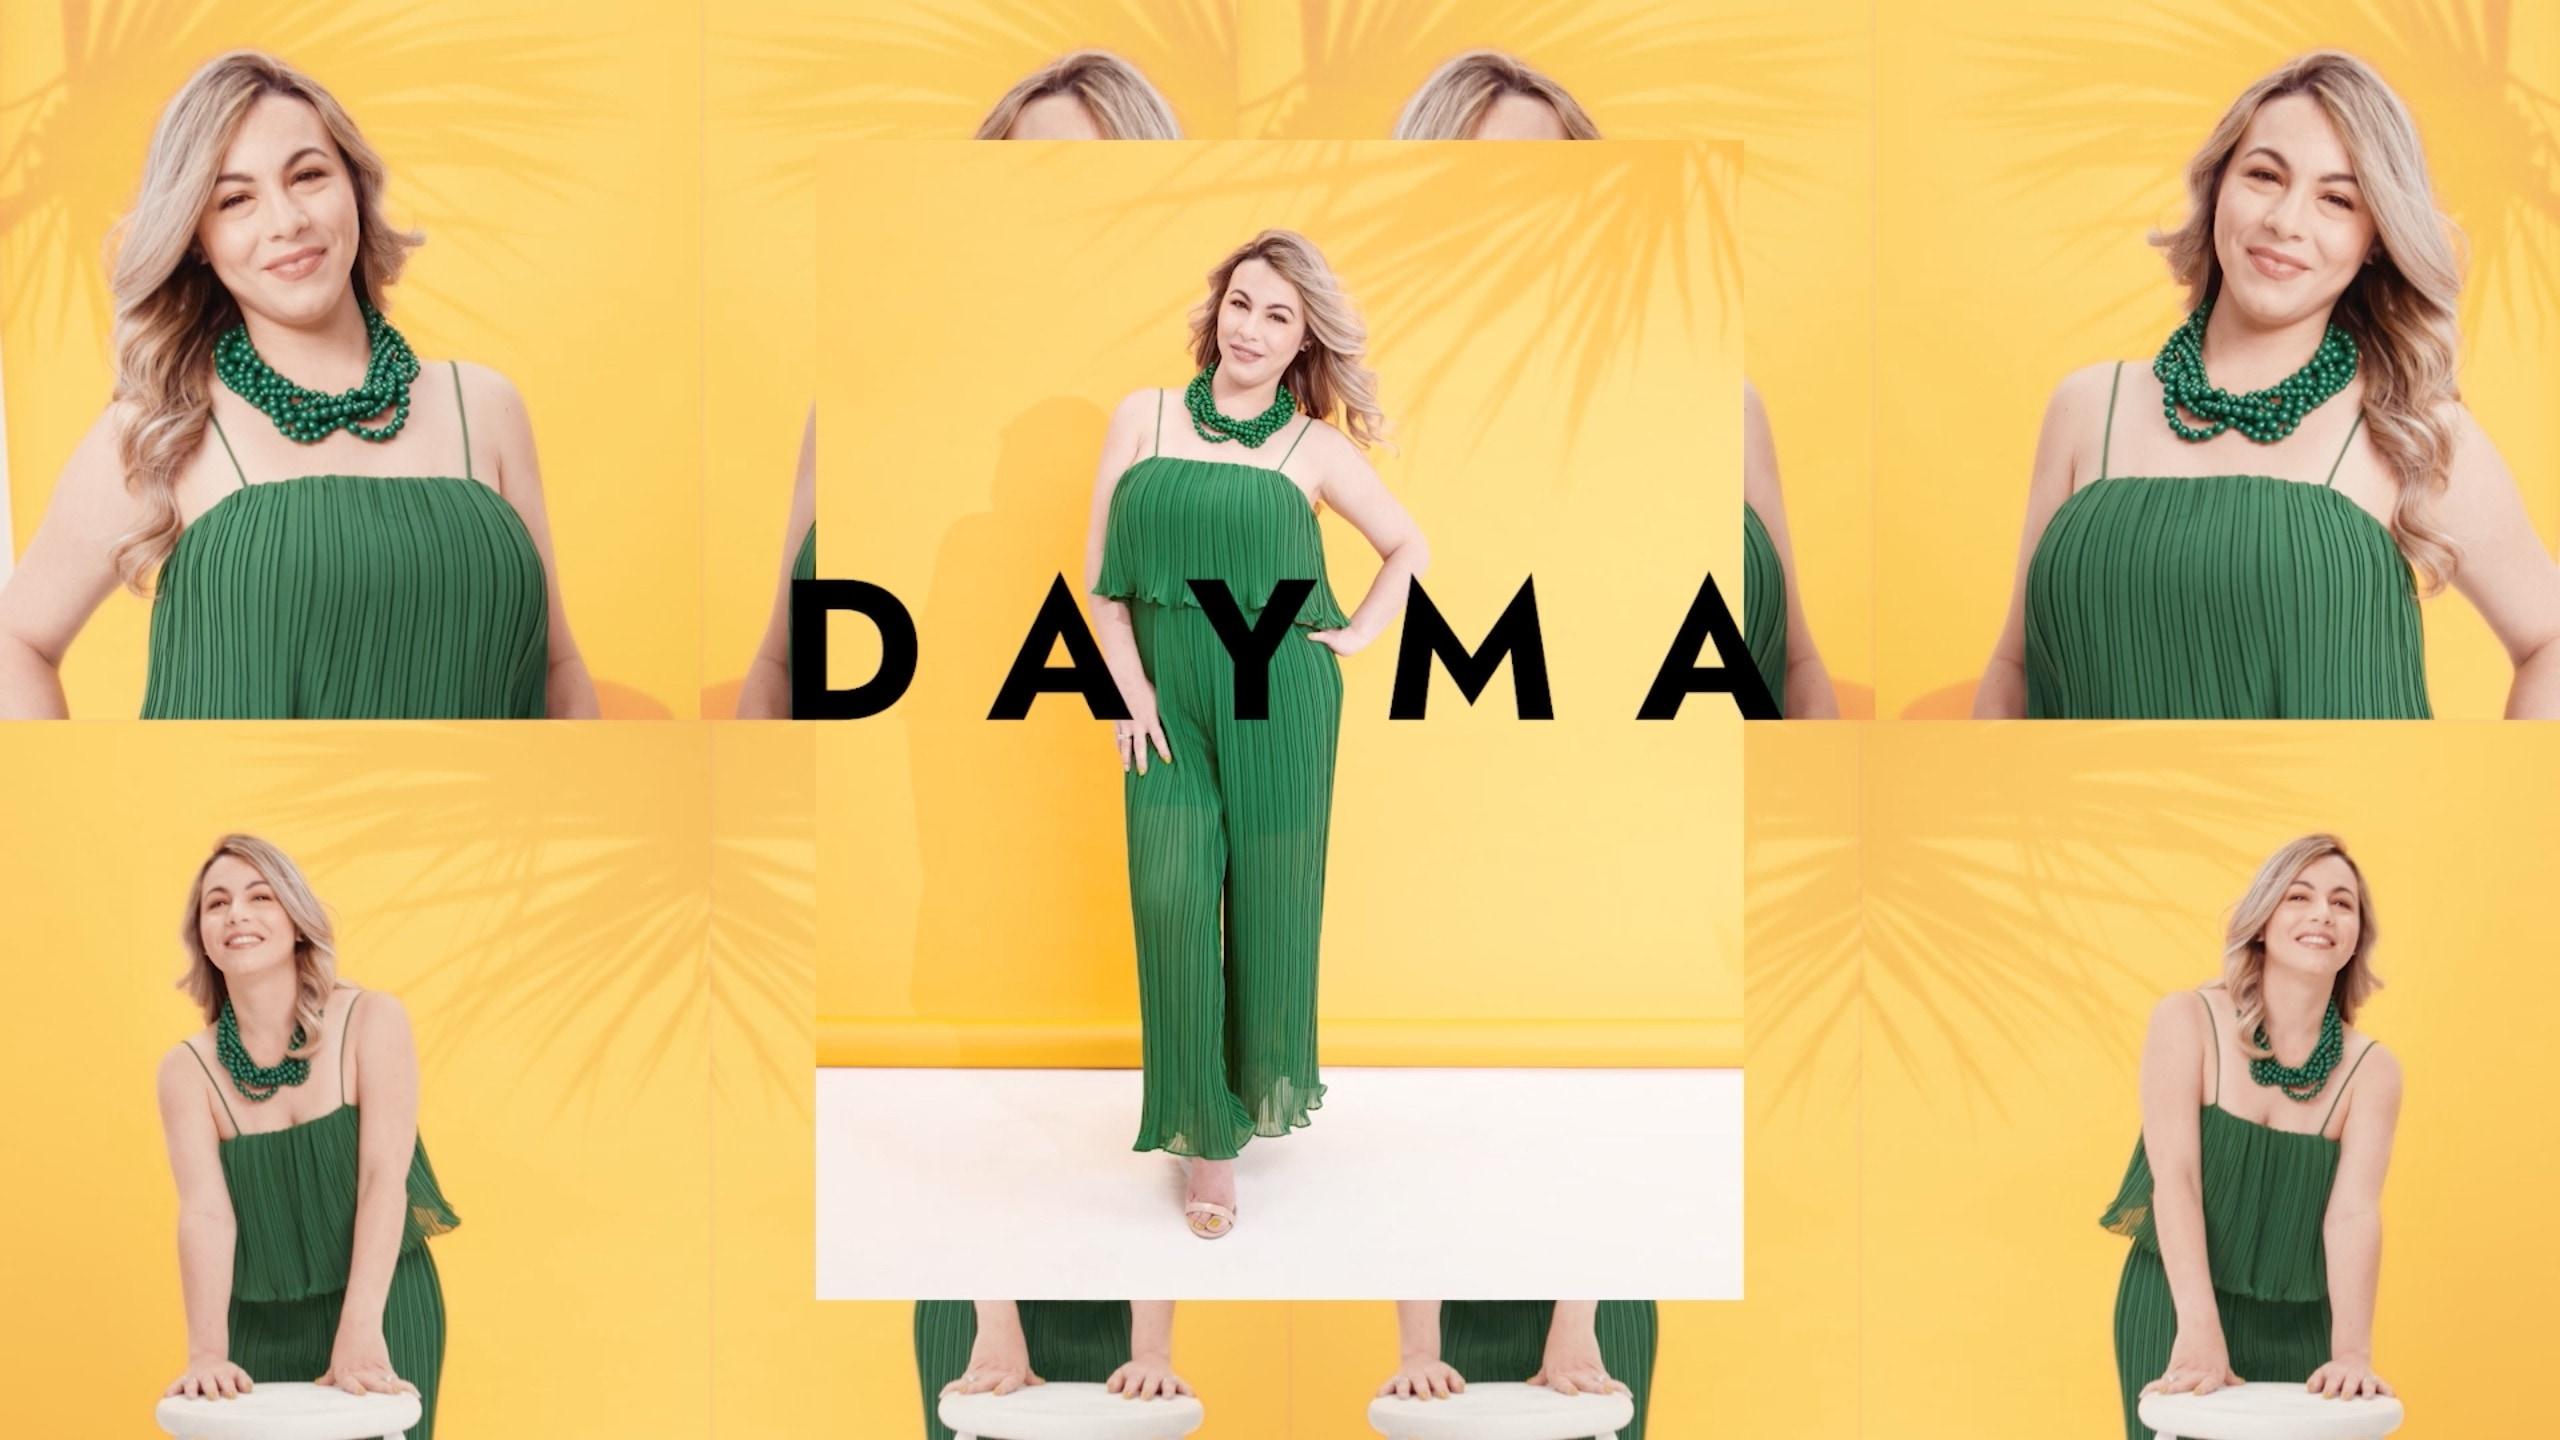 Watch Dayma Urbay discuss Hispanic Heritage Month